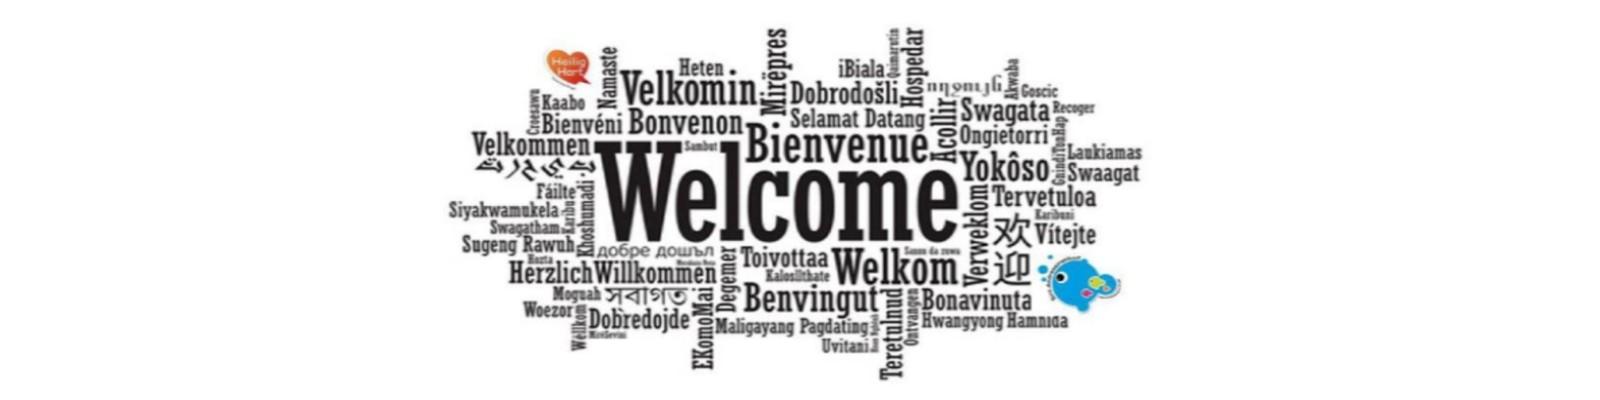 Open Vensters: welkom op onze digitale opendeurdag